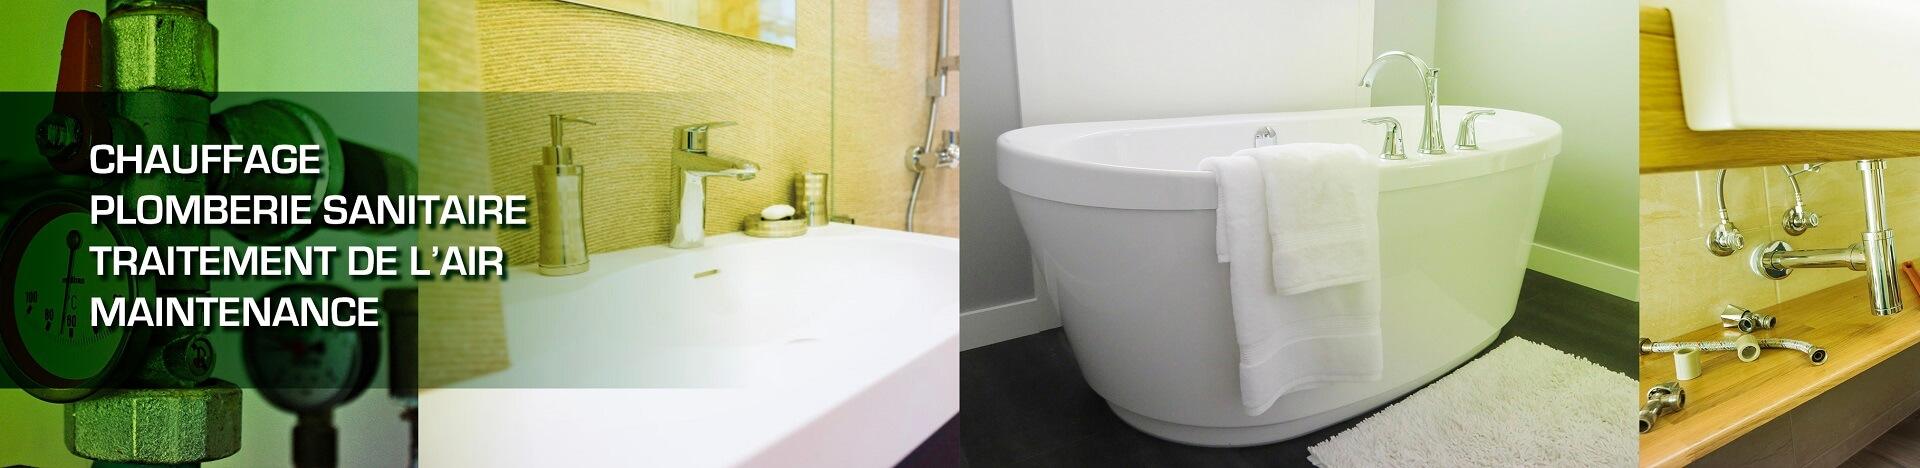 Image sanitaire salle de bain - Ruisseau Chauffage